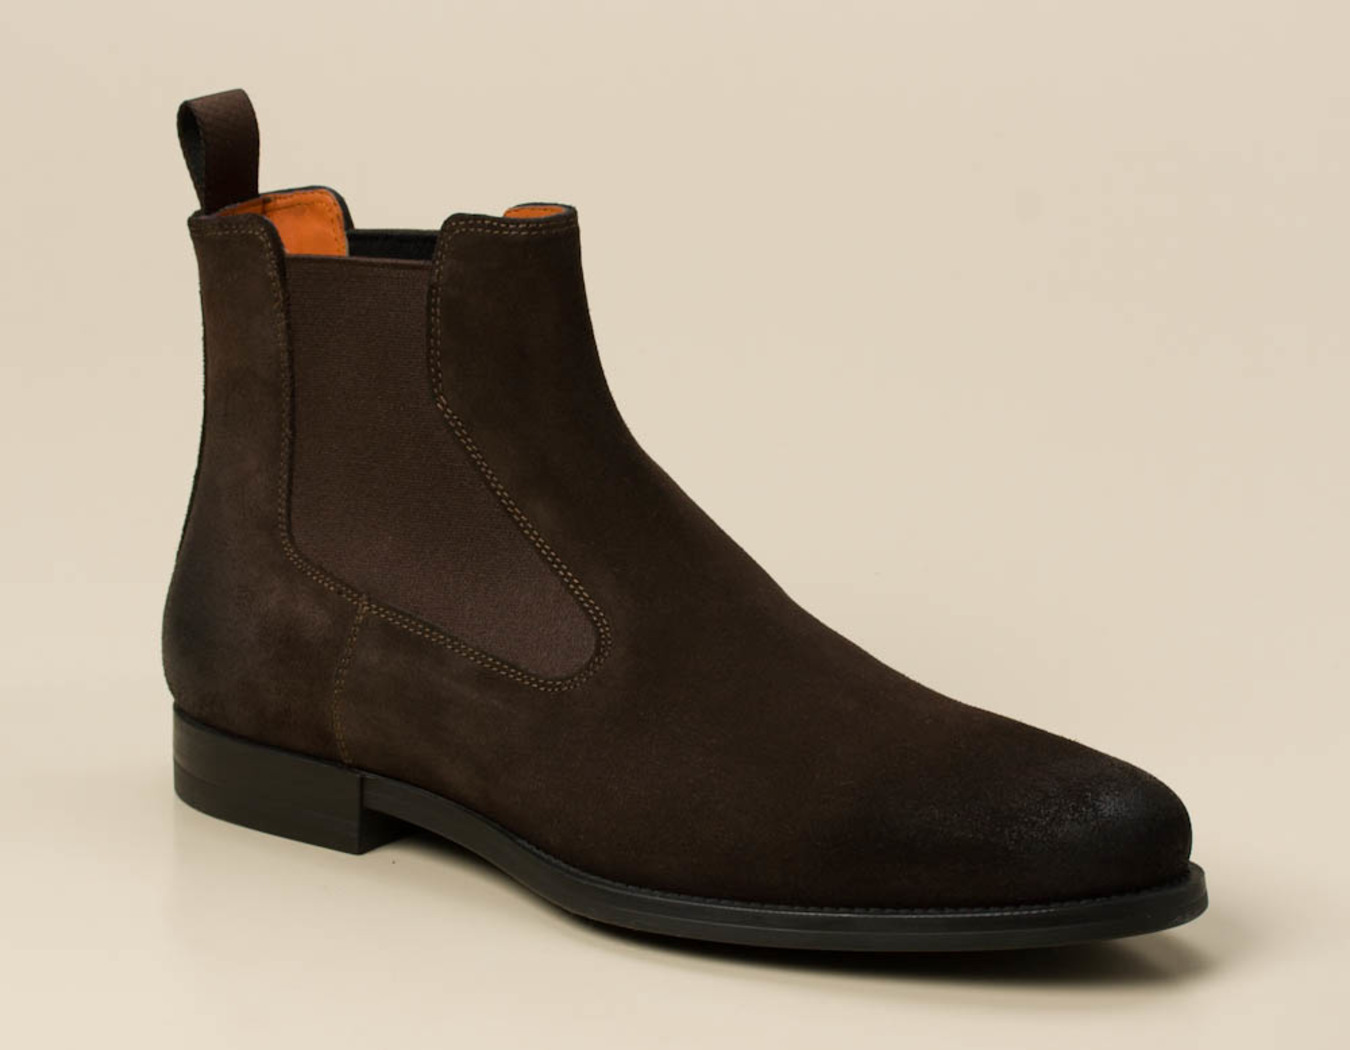 8ada605a35a2a7 Santoni Herren Boots in dunkelbraun kaufen